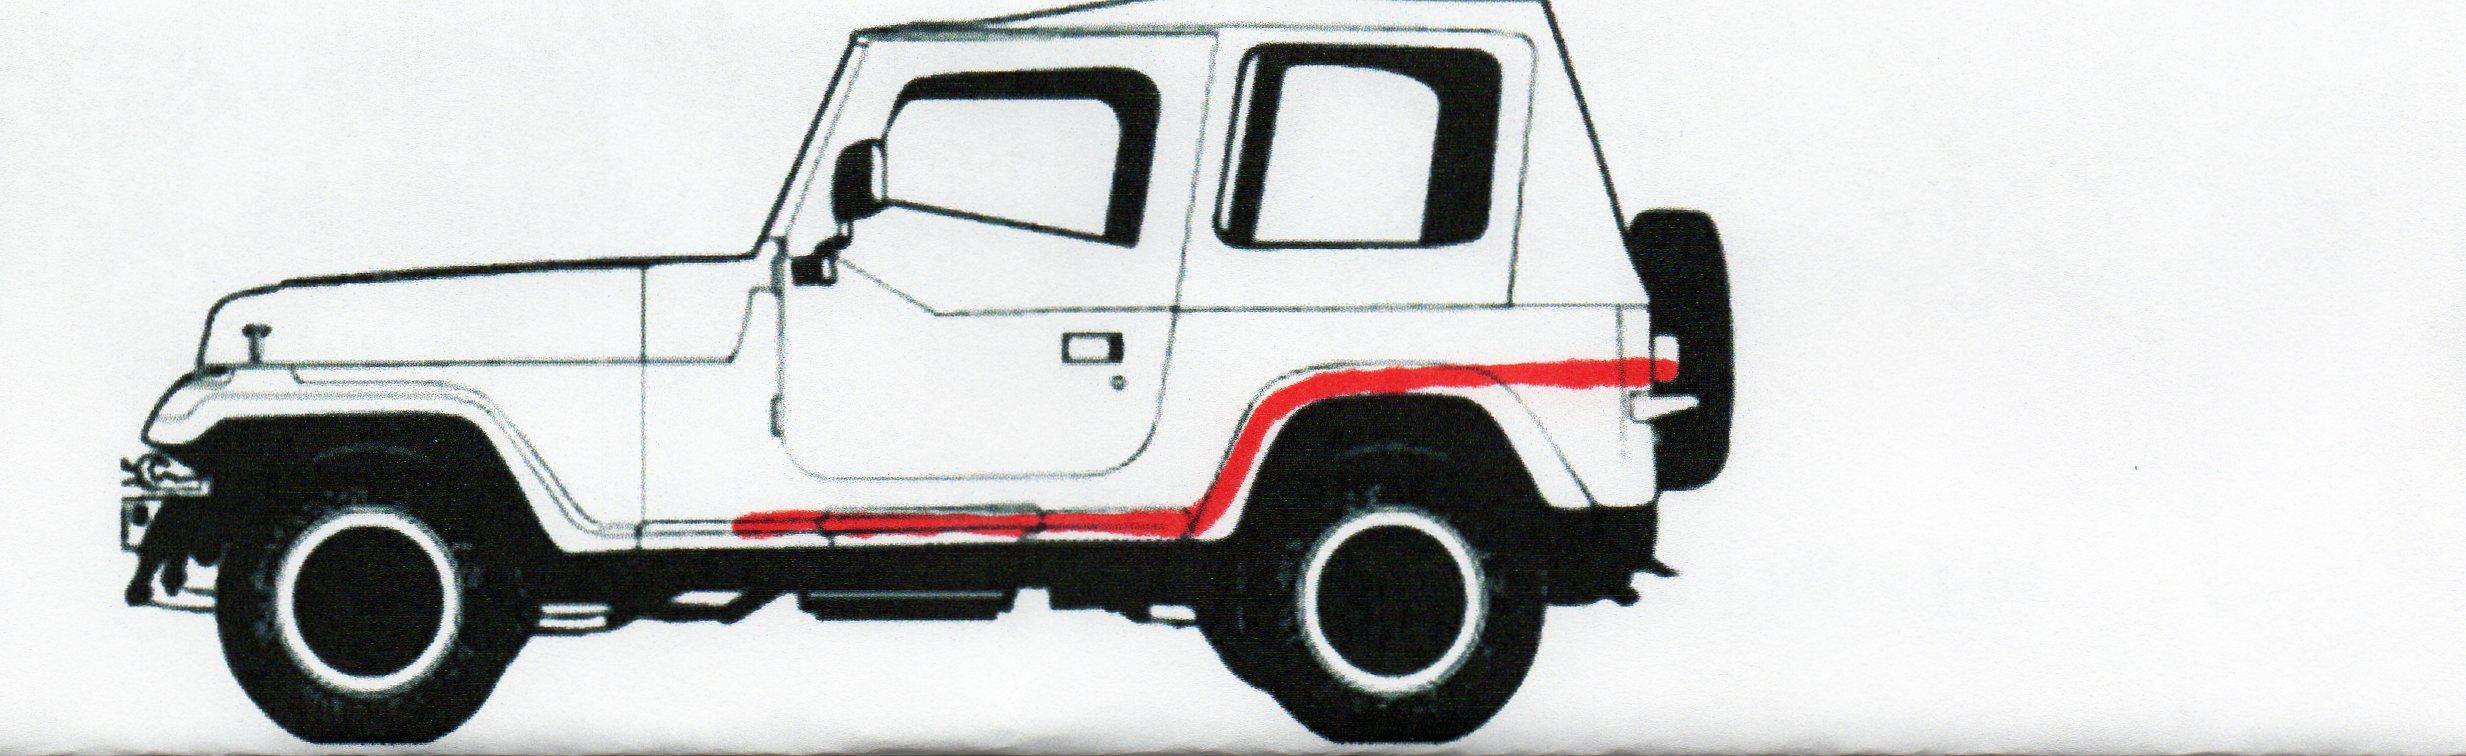 High exhaust exit (aka exhaust snorkel) - JeepForum com